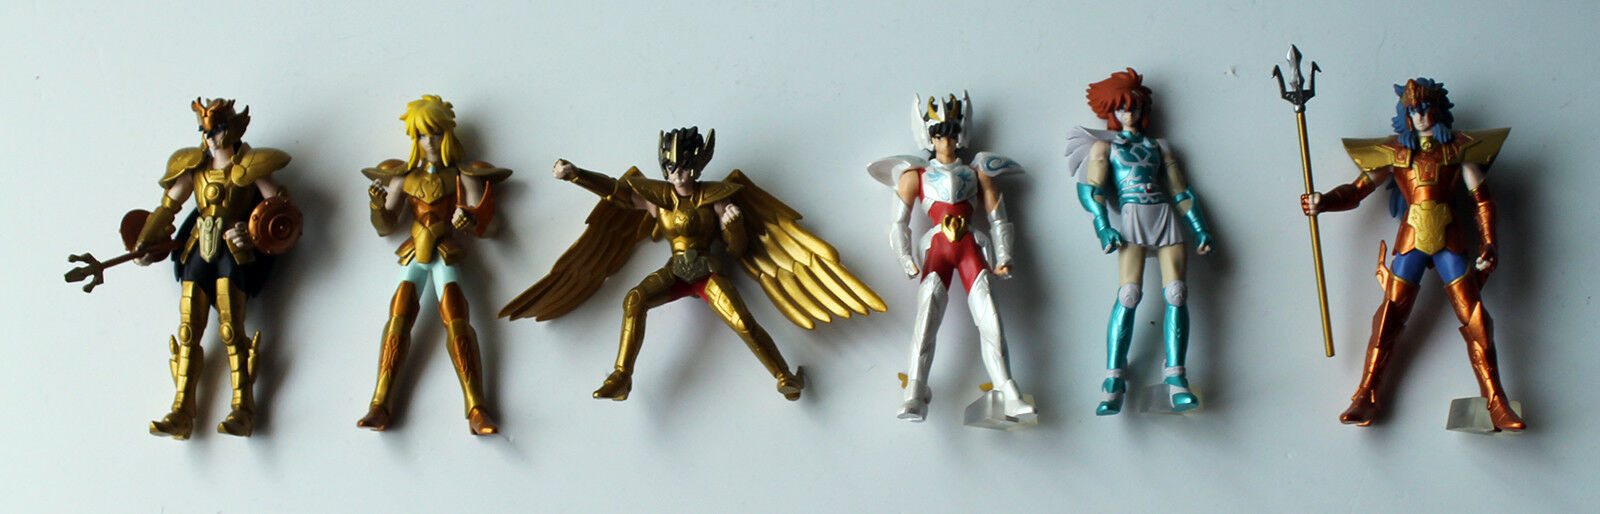 HGIF Saint Seiya  6 Bandai Gashapon Minifigure